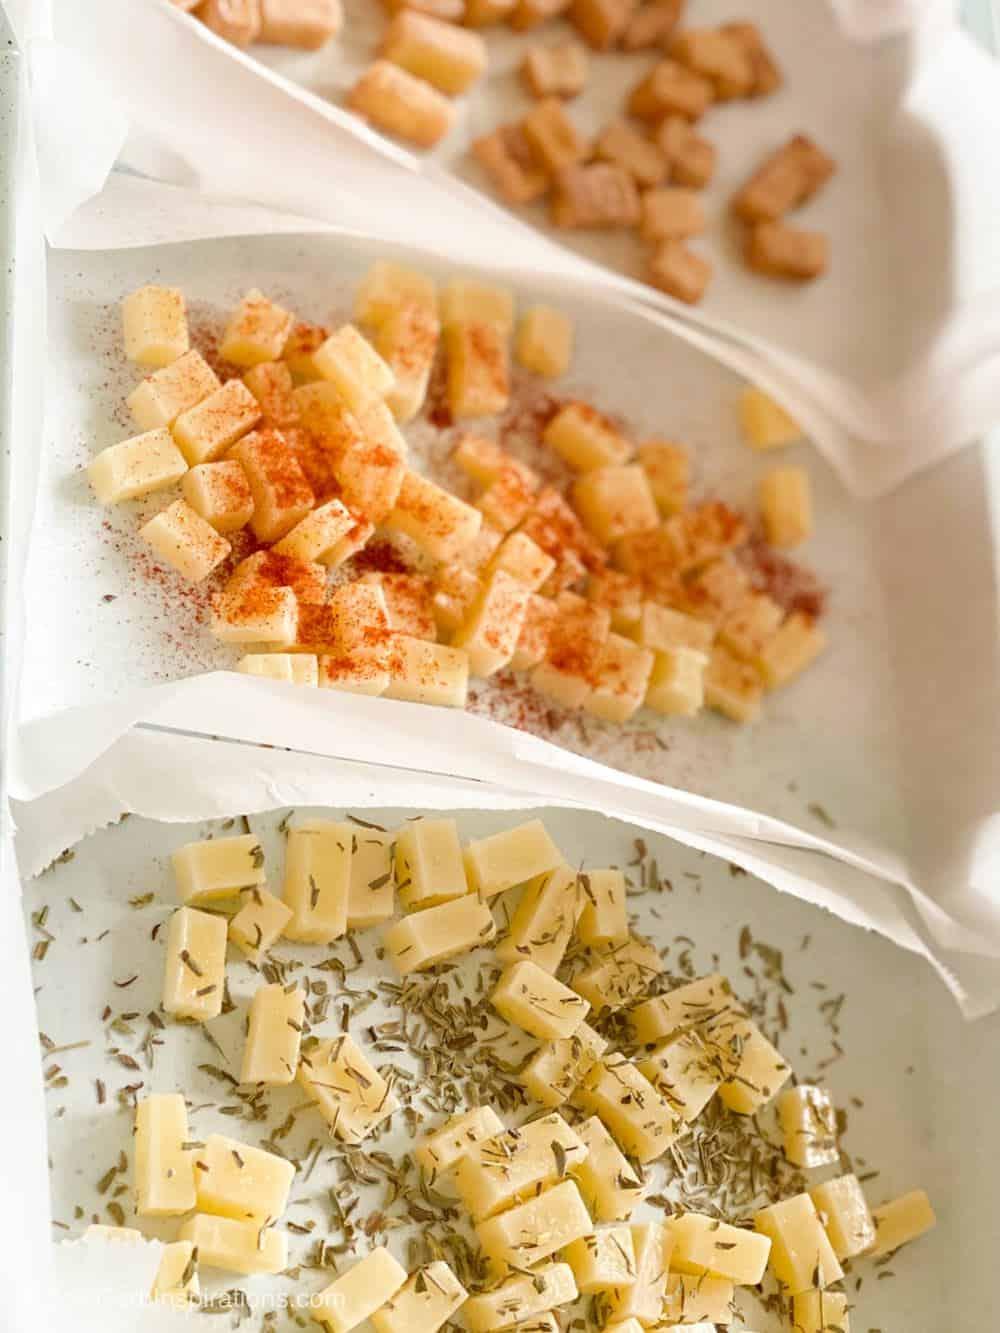 Seasoned cheese cubes